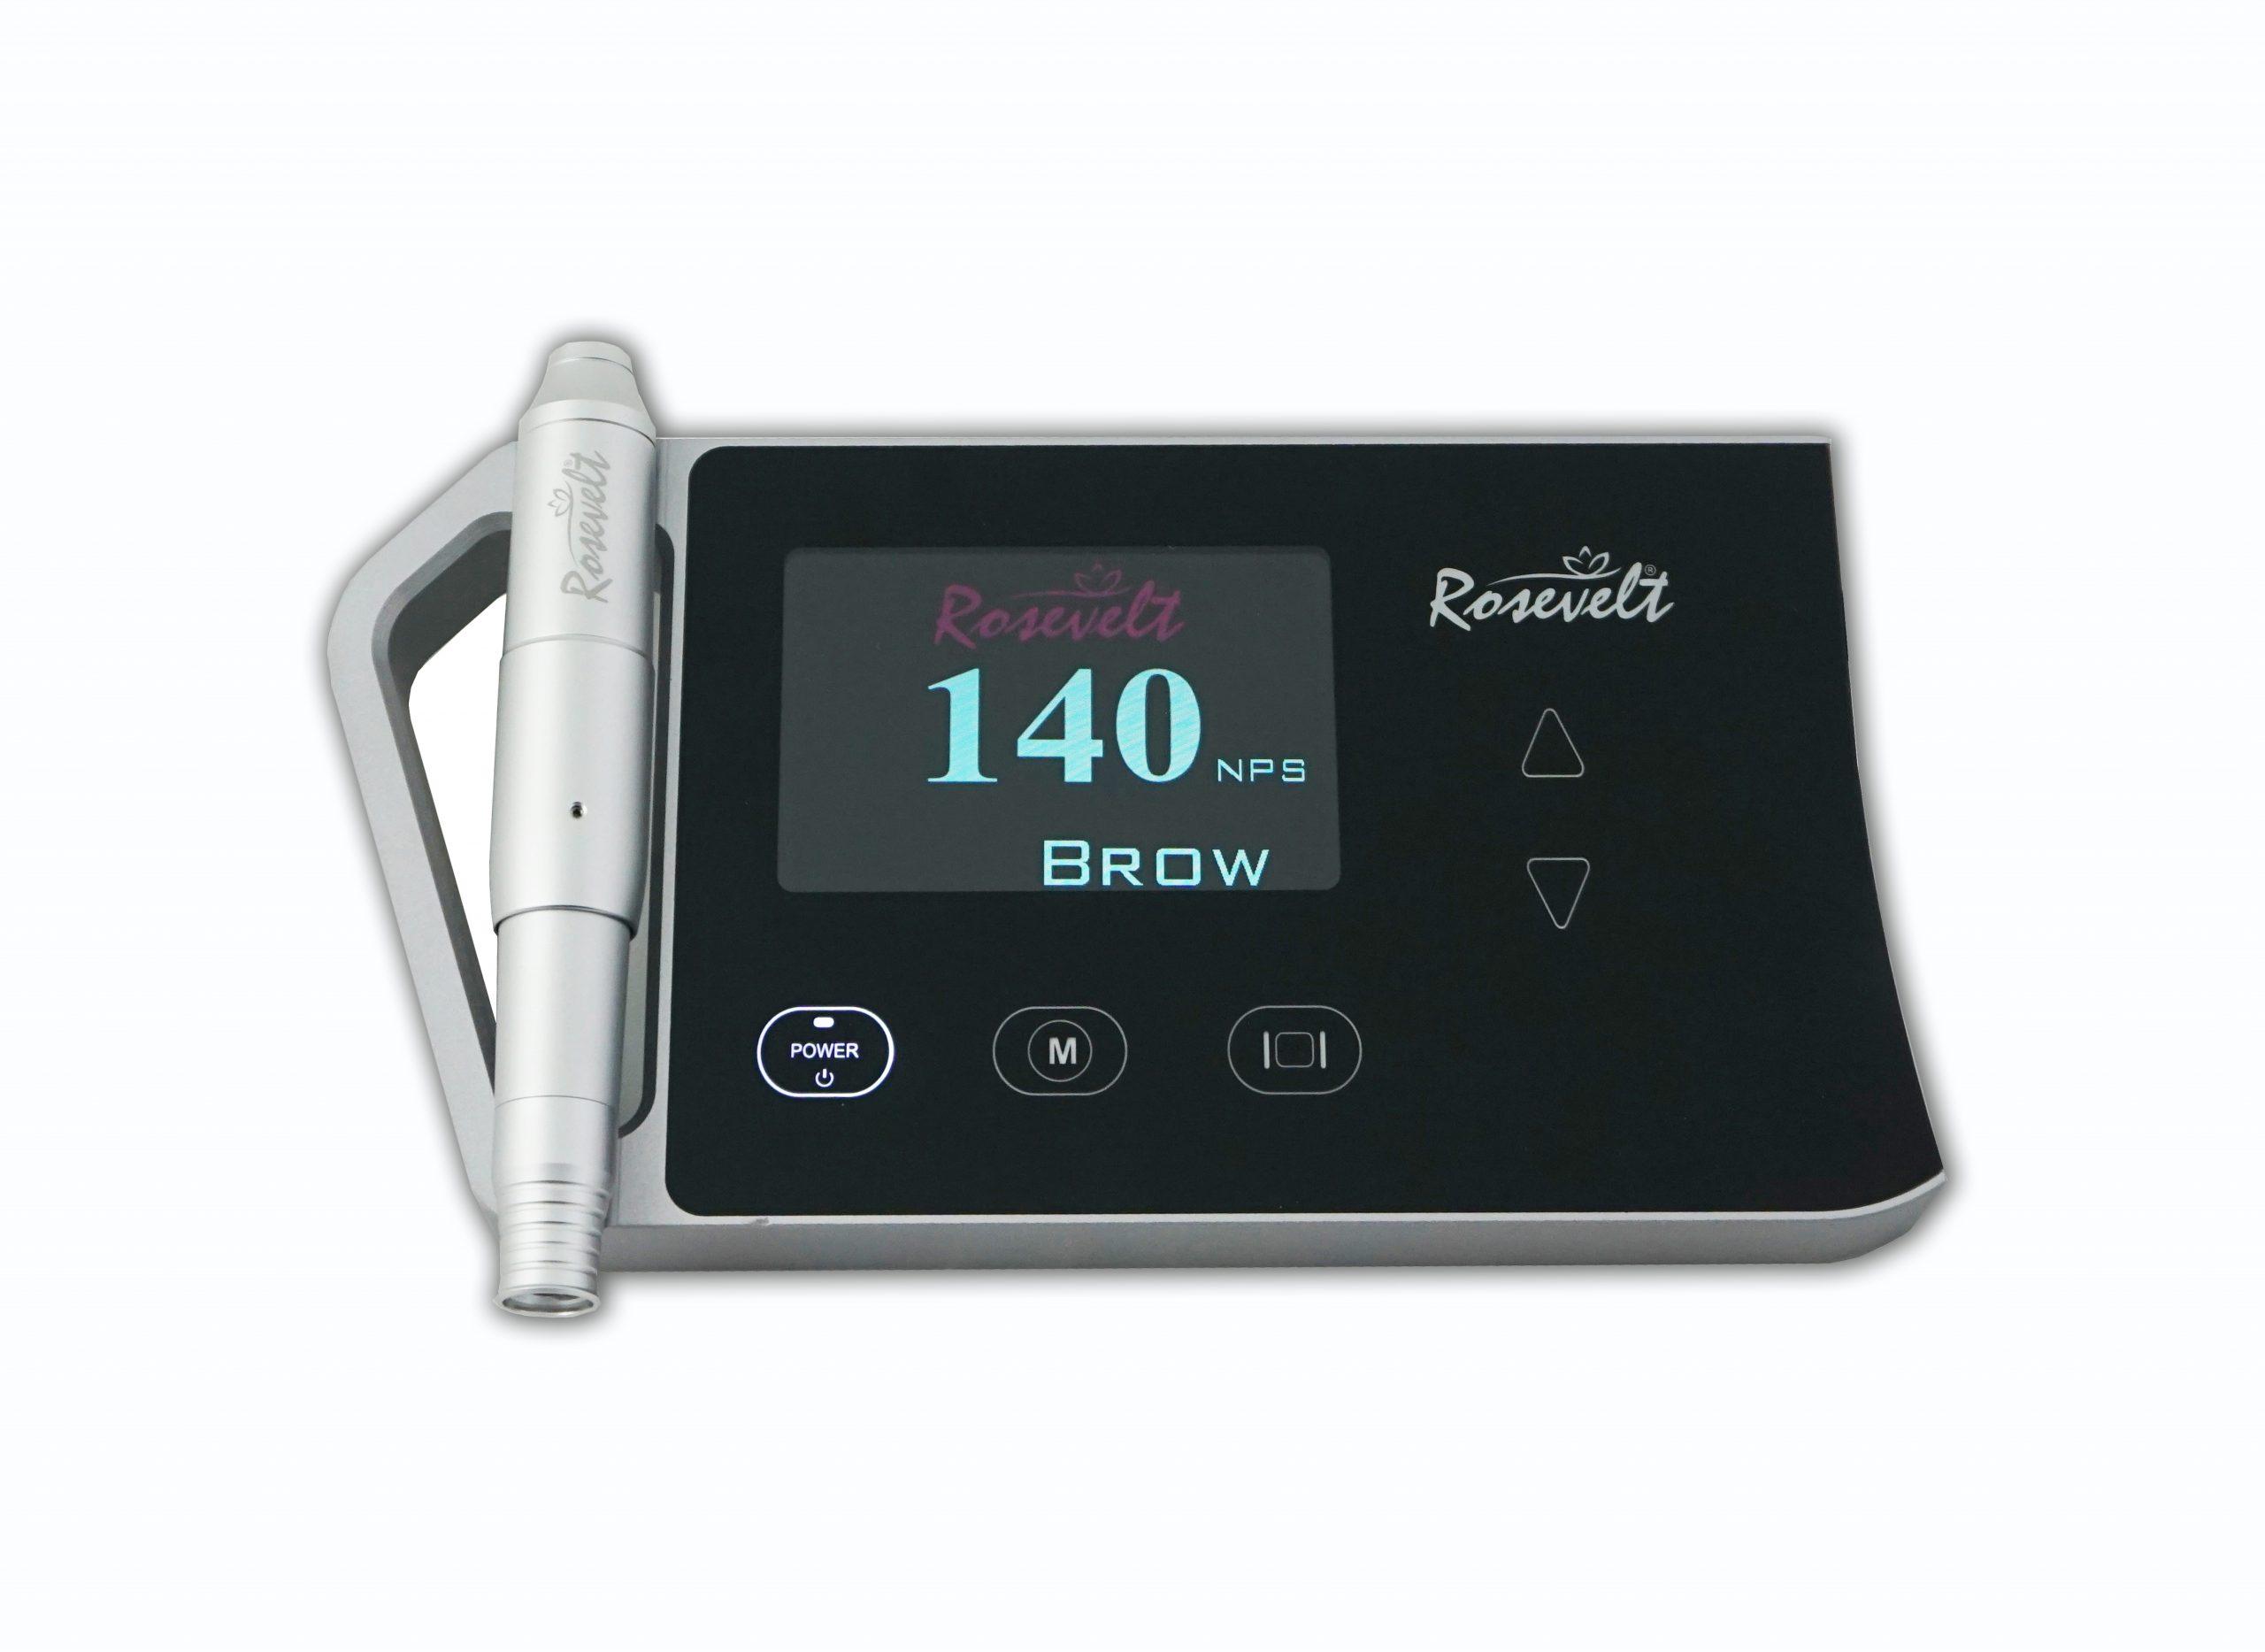 siyah cihaz - Rosevelt X5 Kalıcı Makyaj Cihazı